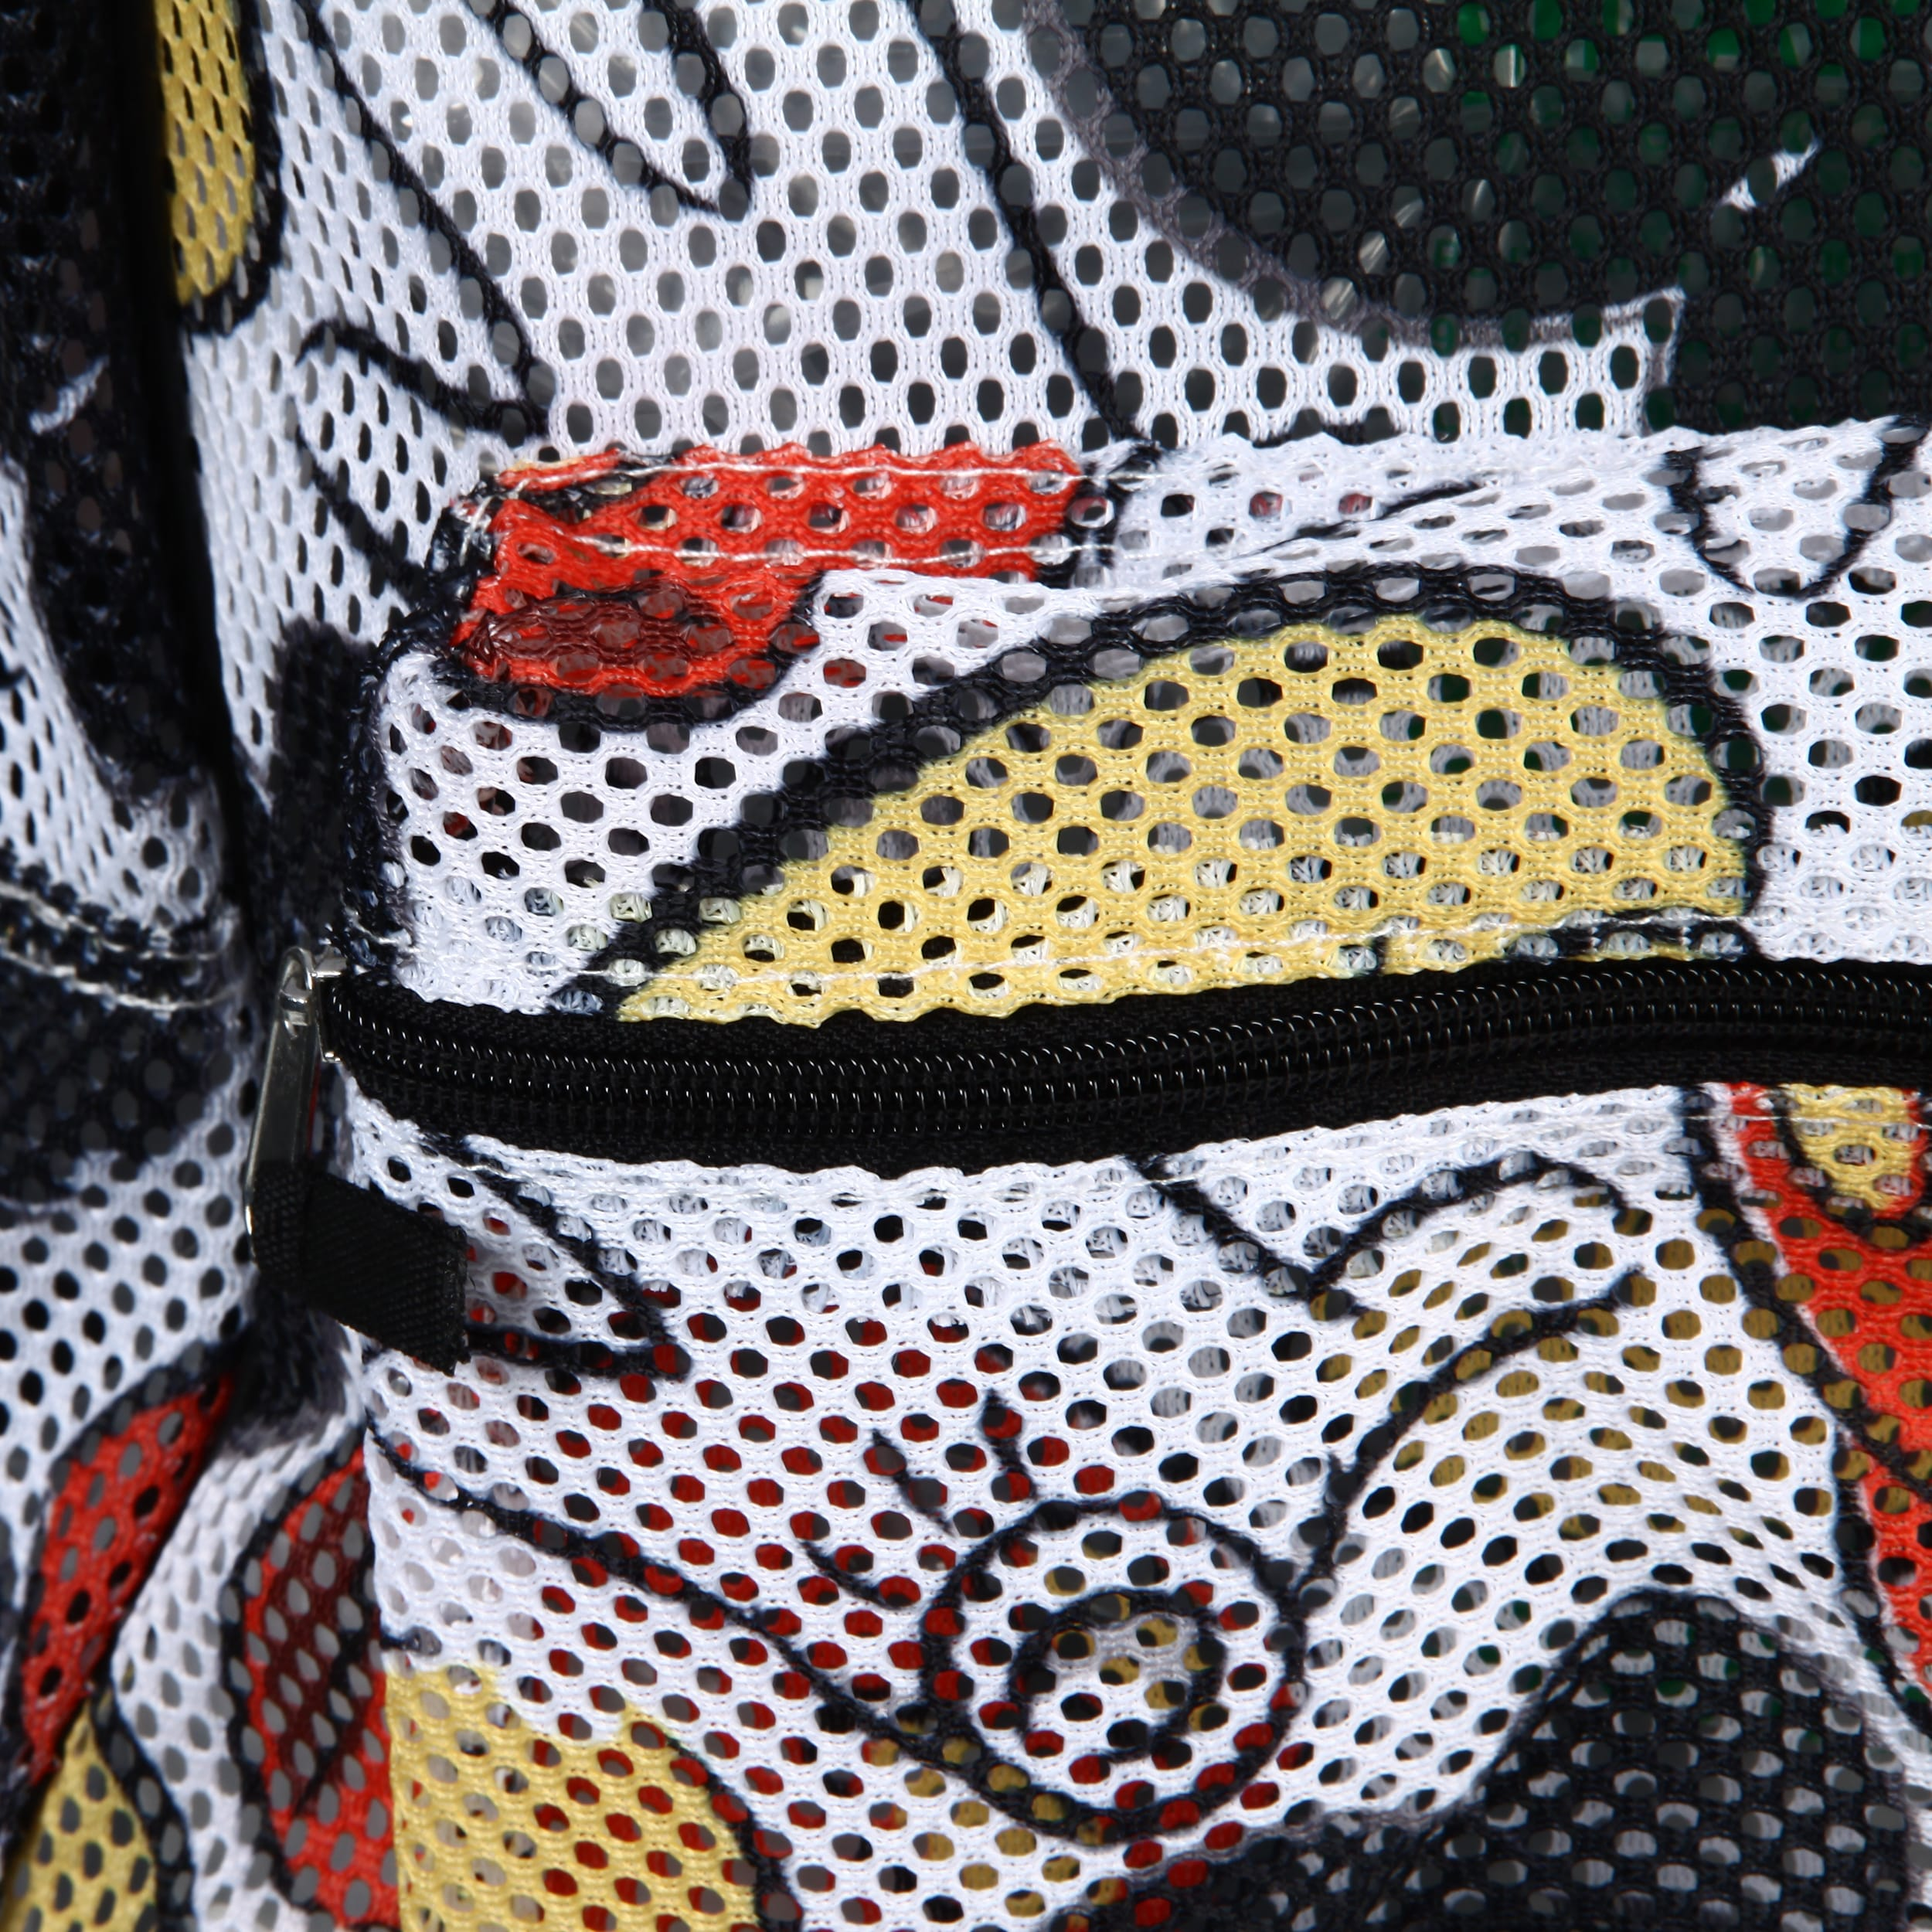 e670eb66e832 Disney Mickey Mouse All-over Print Mesh Backpack